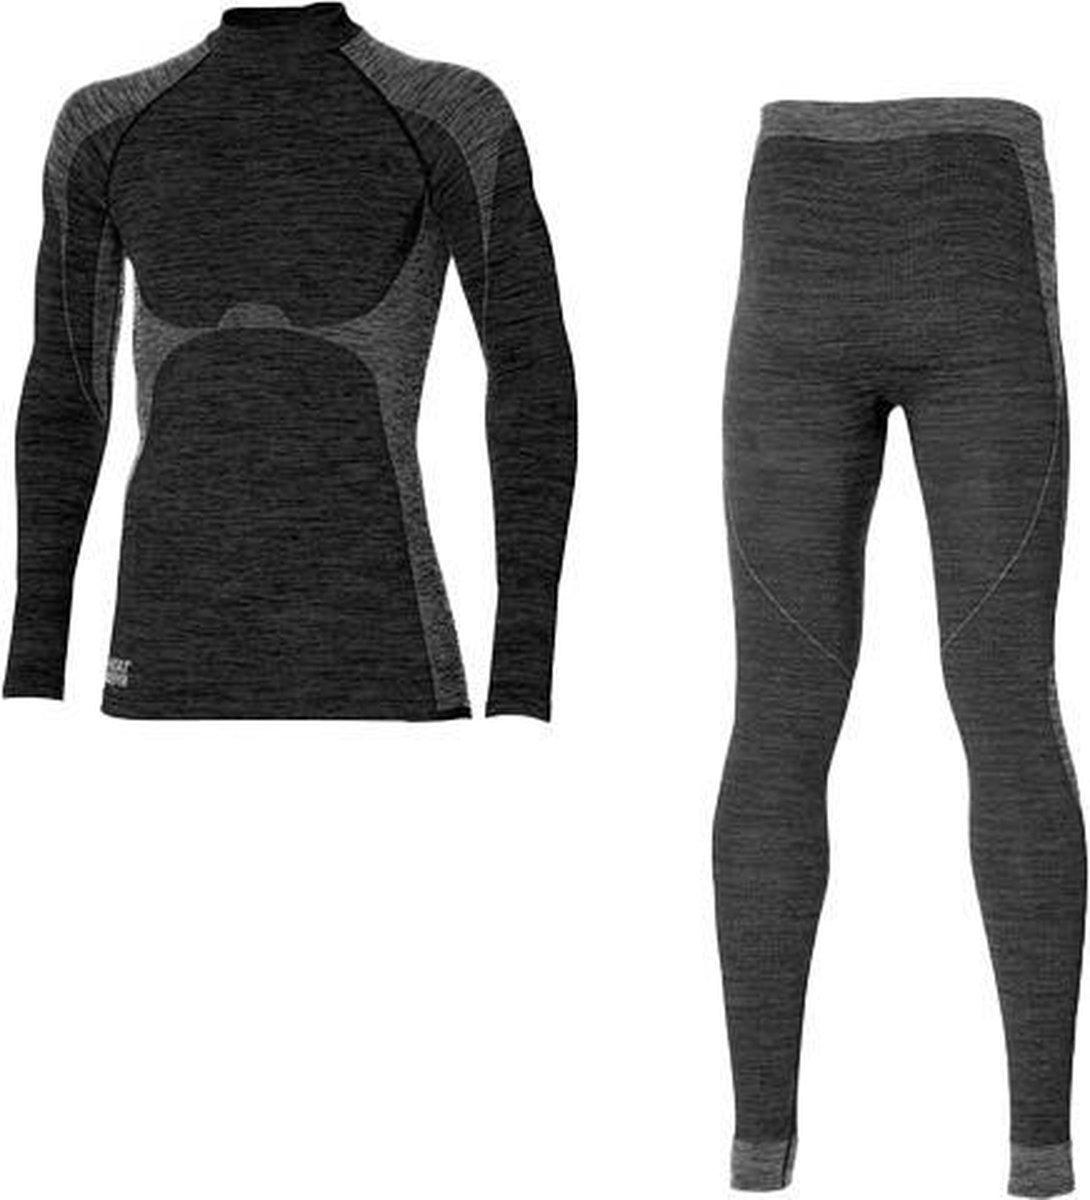 Premium thermokleding - Type: Heren, maat M - Broek en shirt - Thermoset